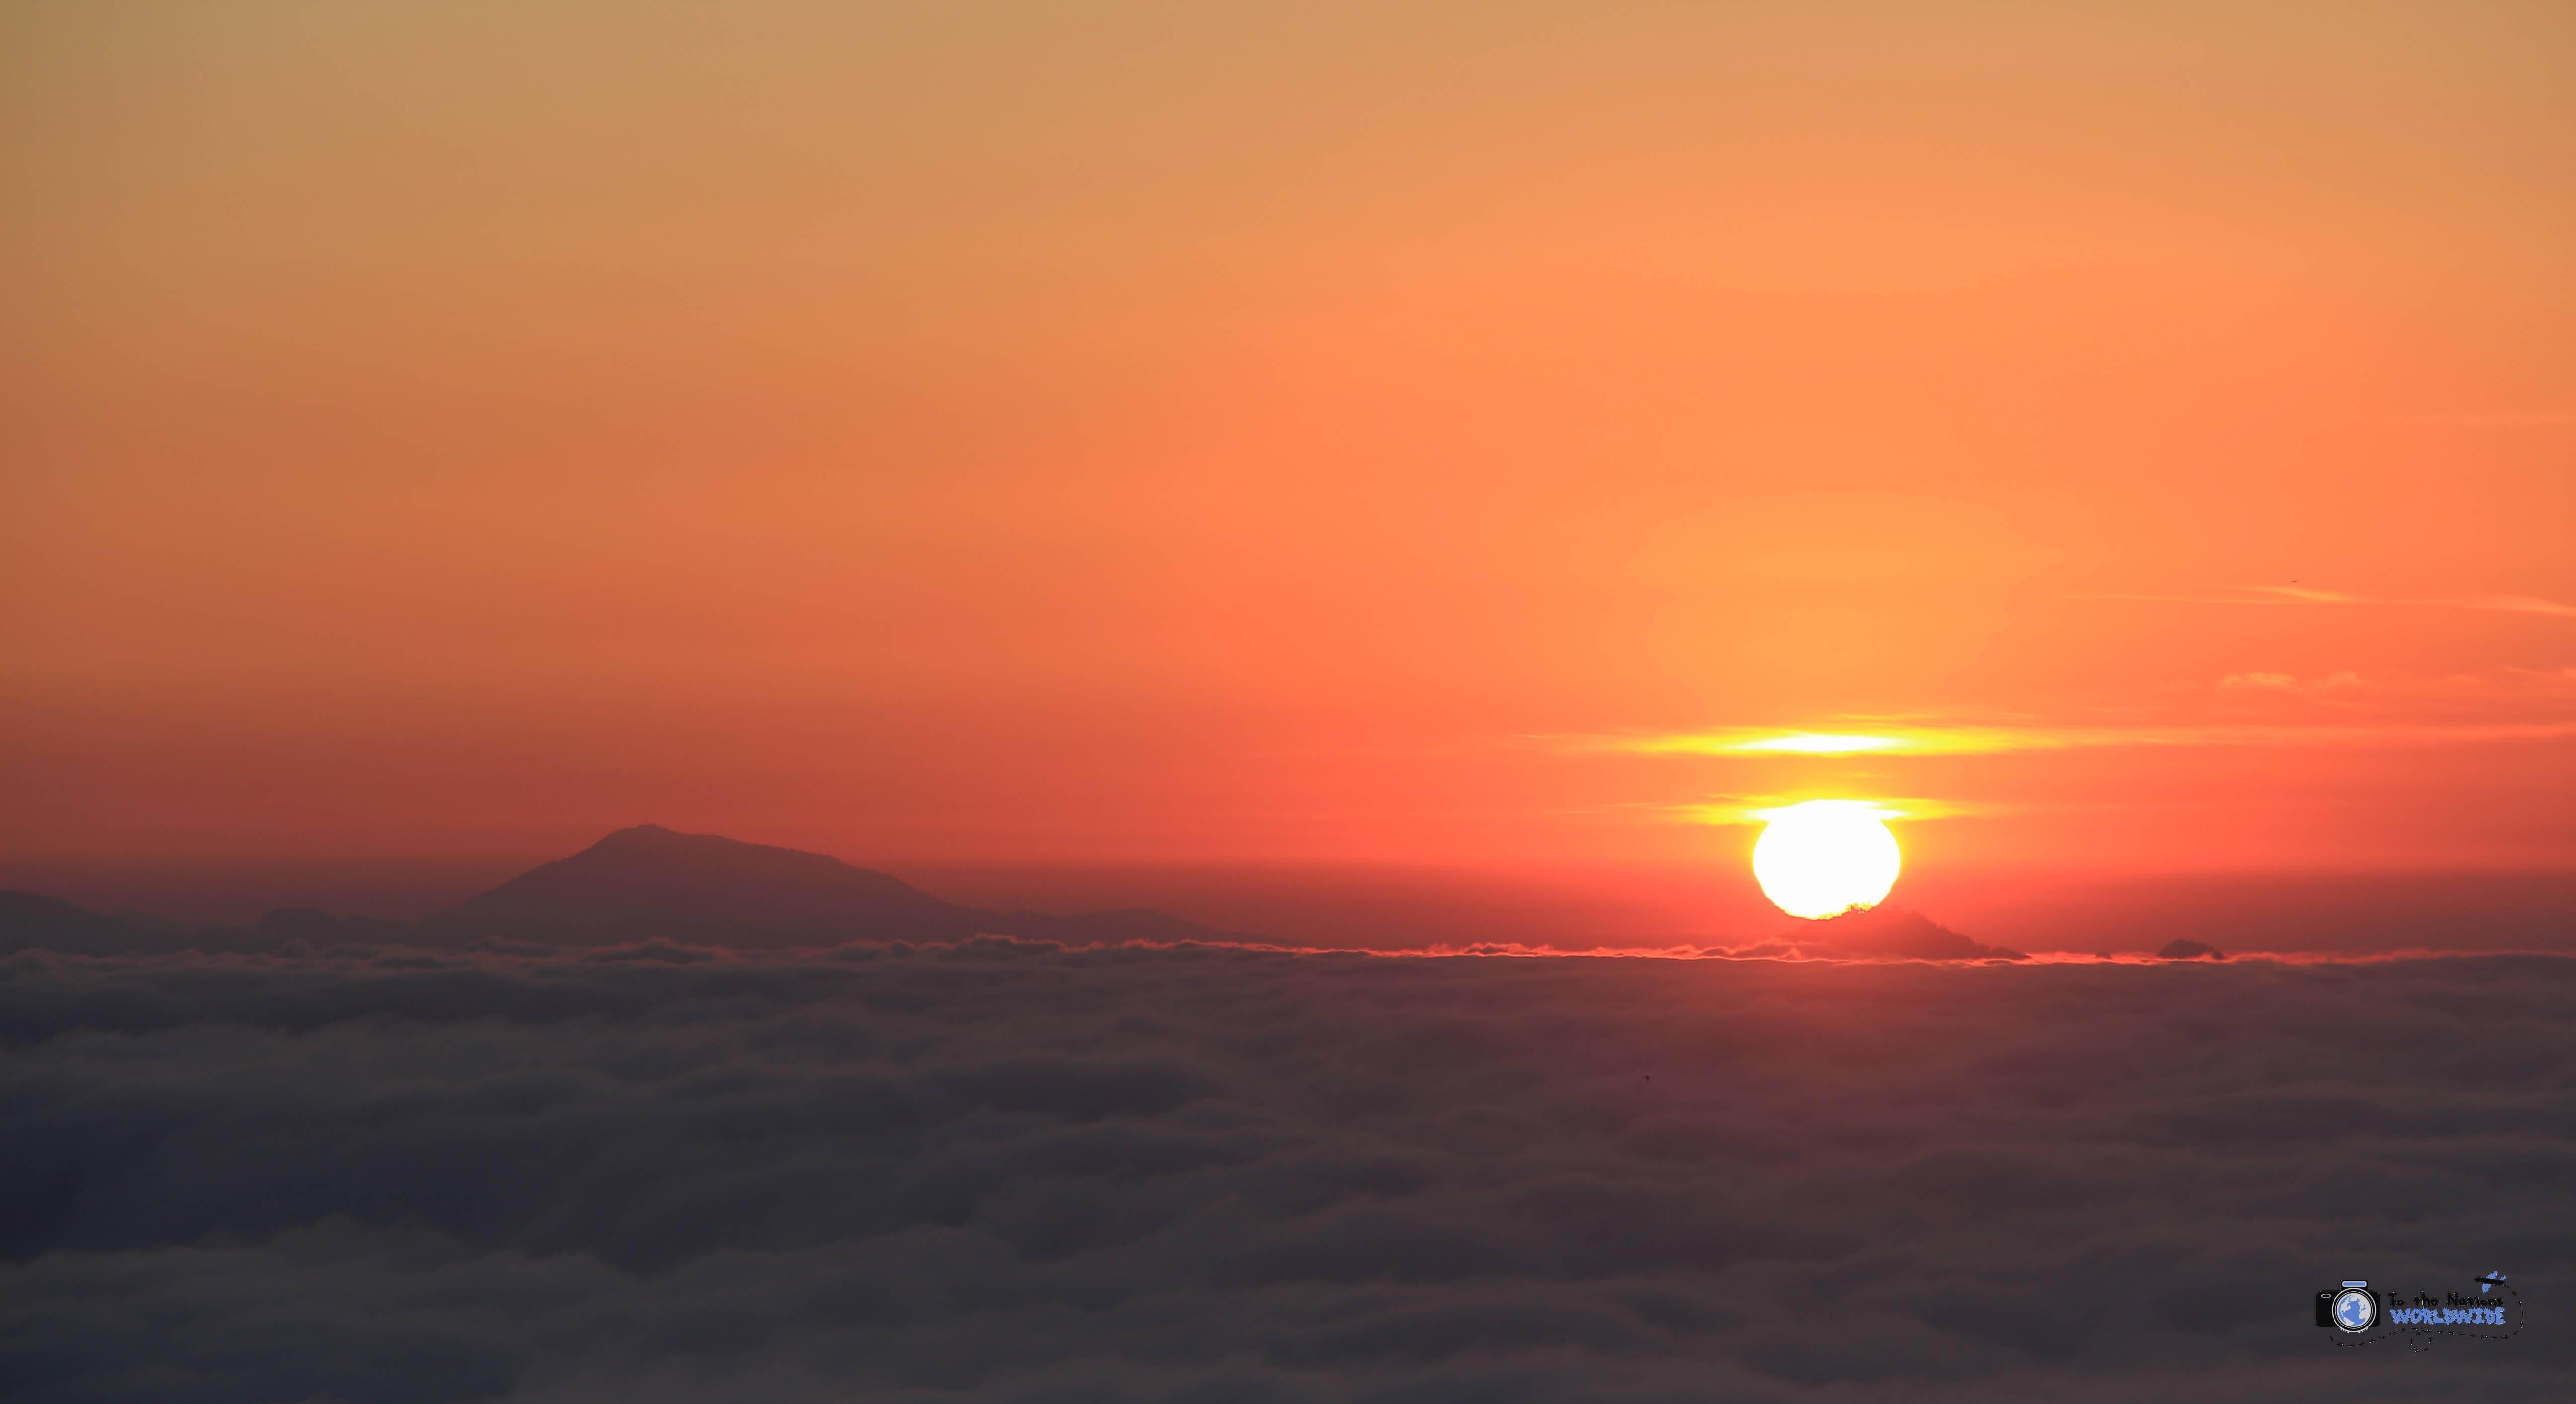 Sunrise from atop Sarangkot Mountain in Pokhara, Nepal